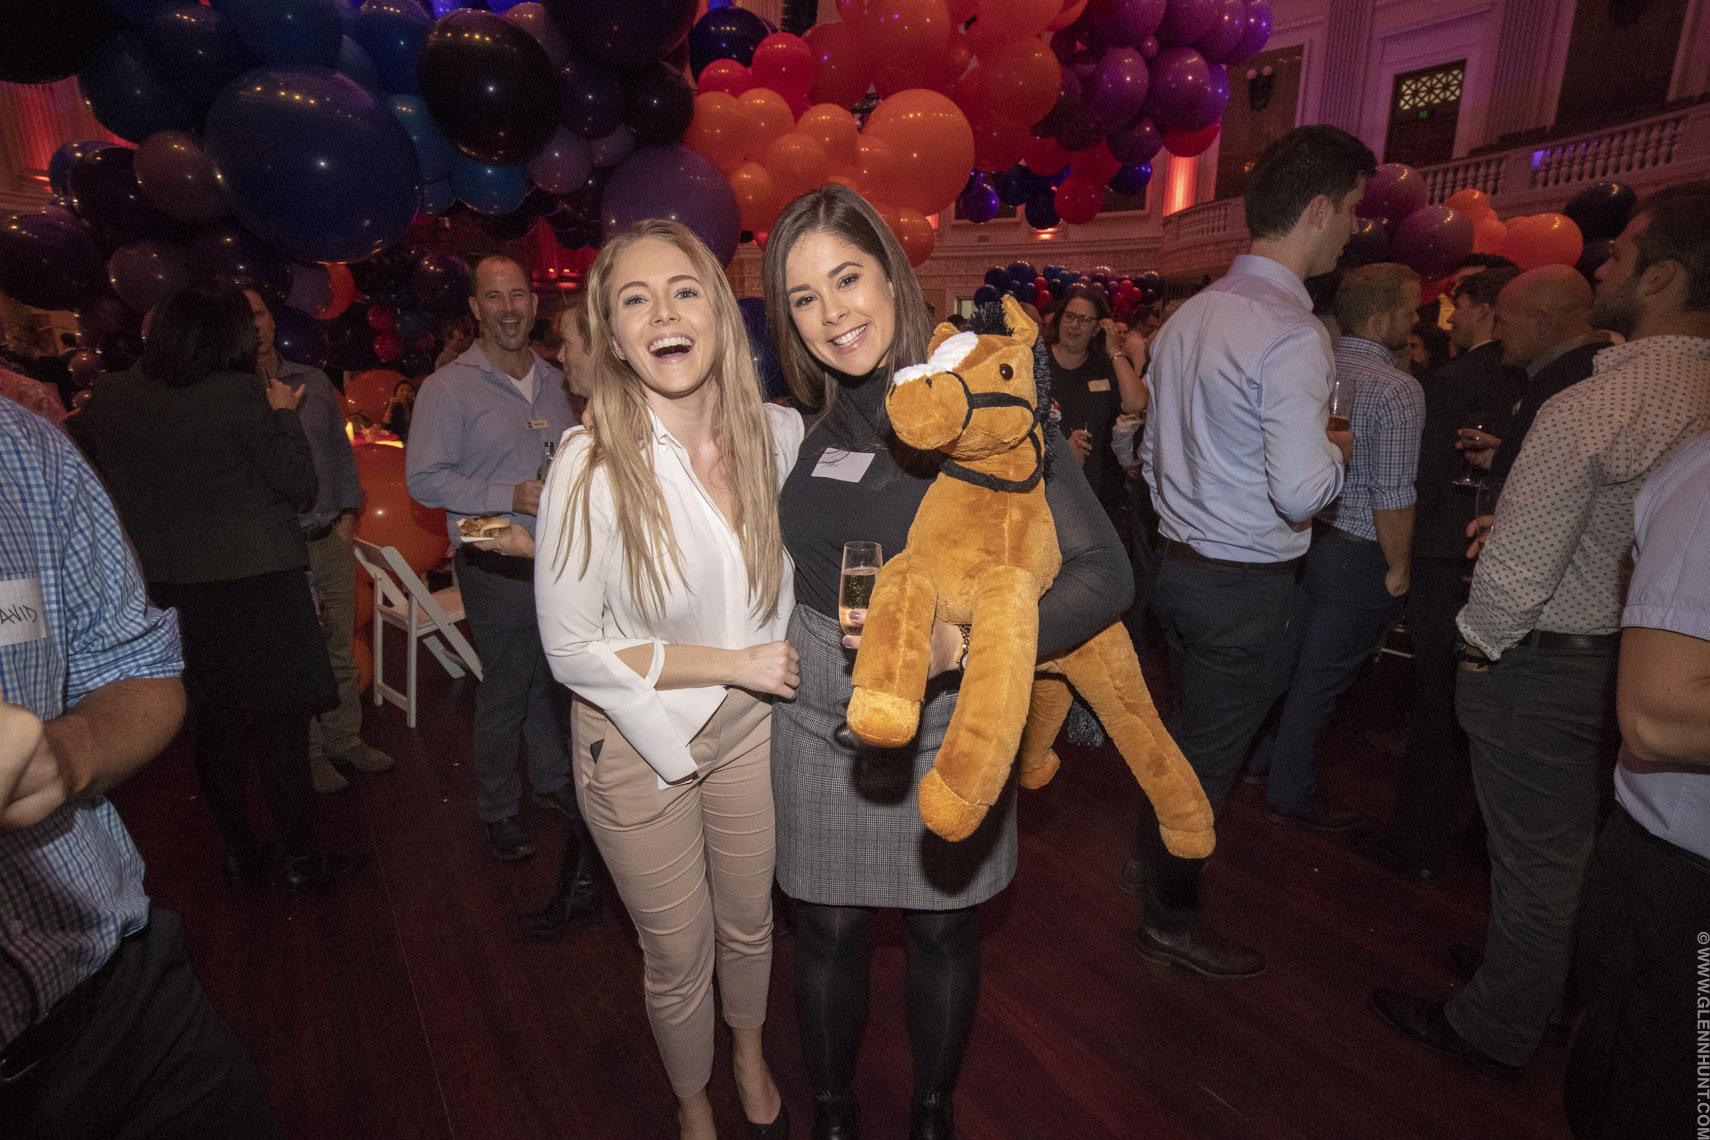 Brisbane Corporate Event photographers